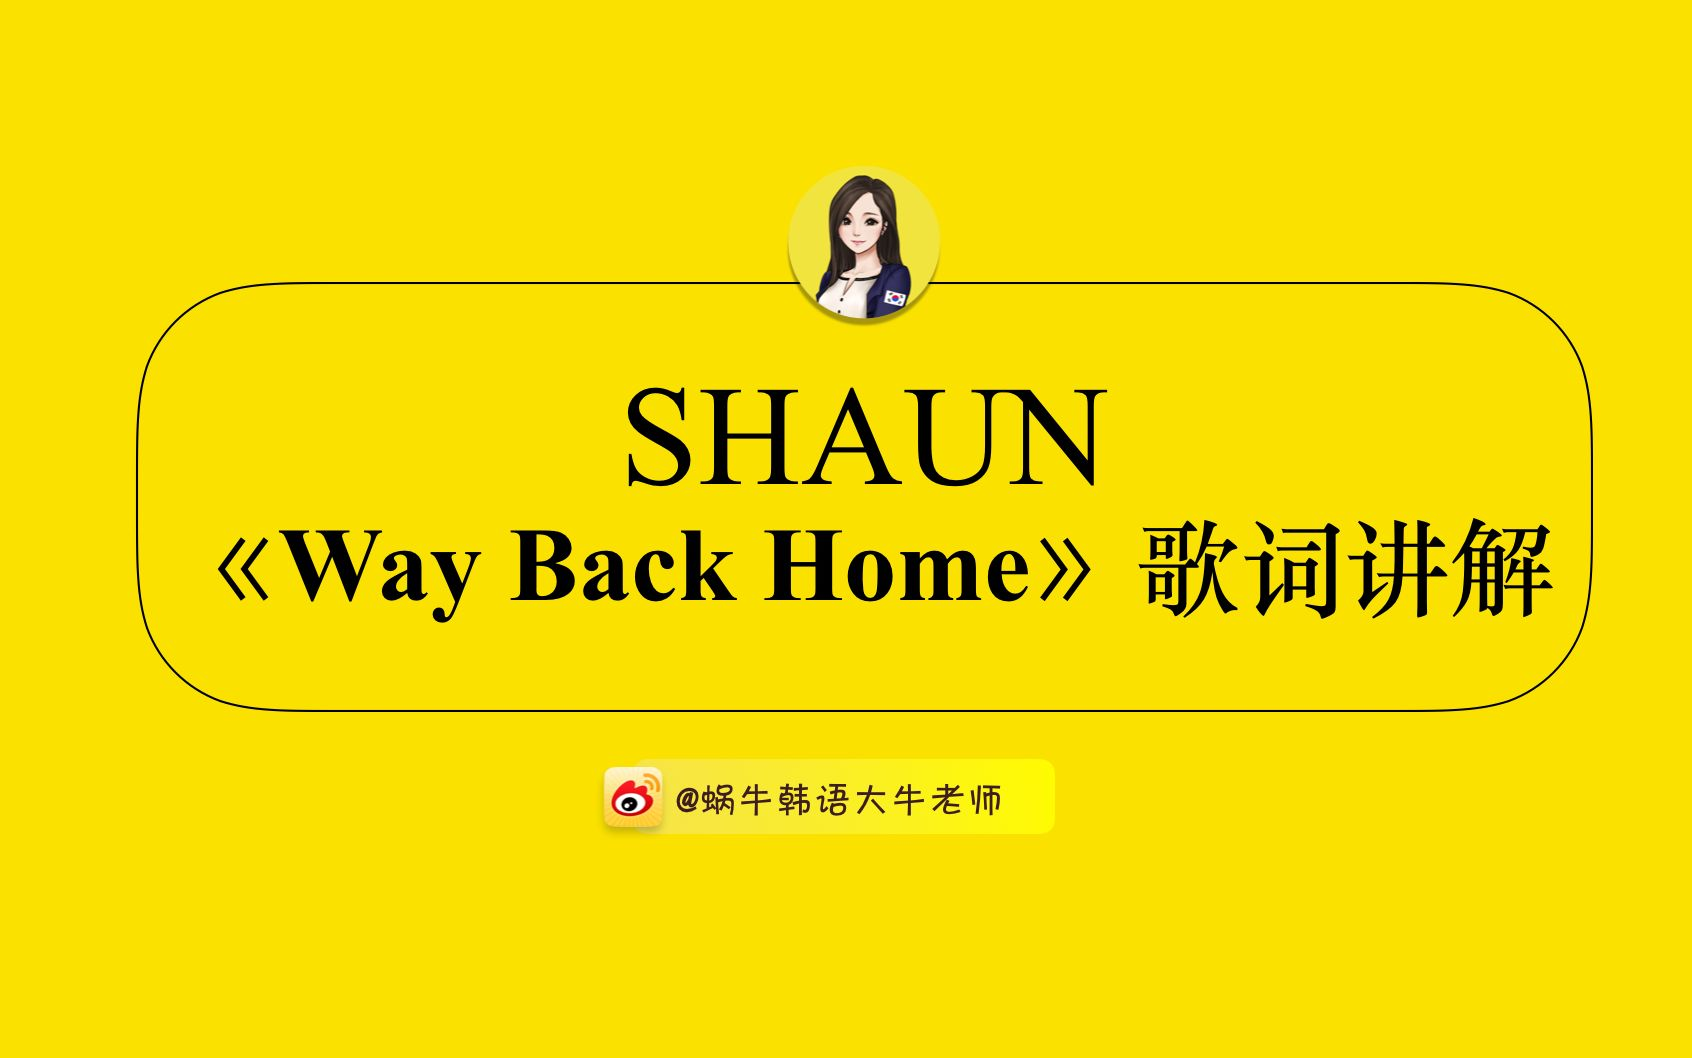 Home 歌詞 back Way 英語